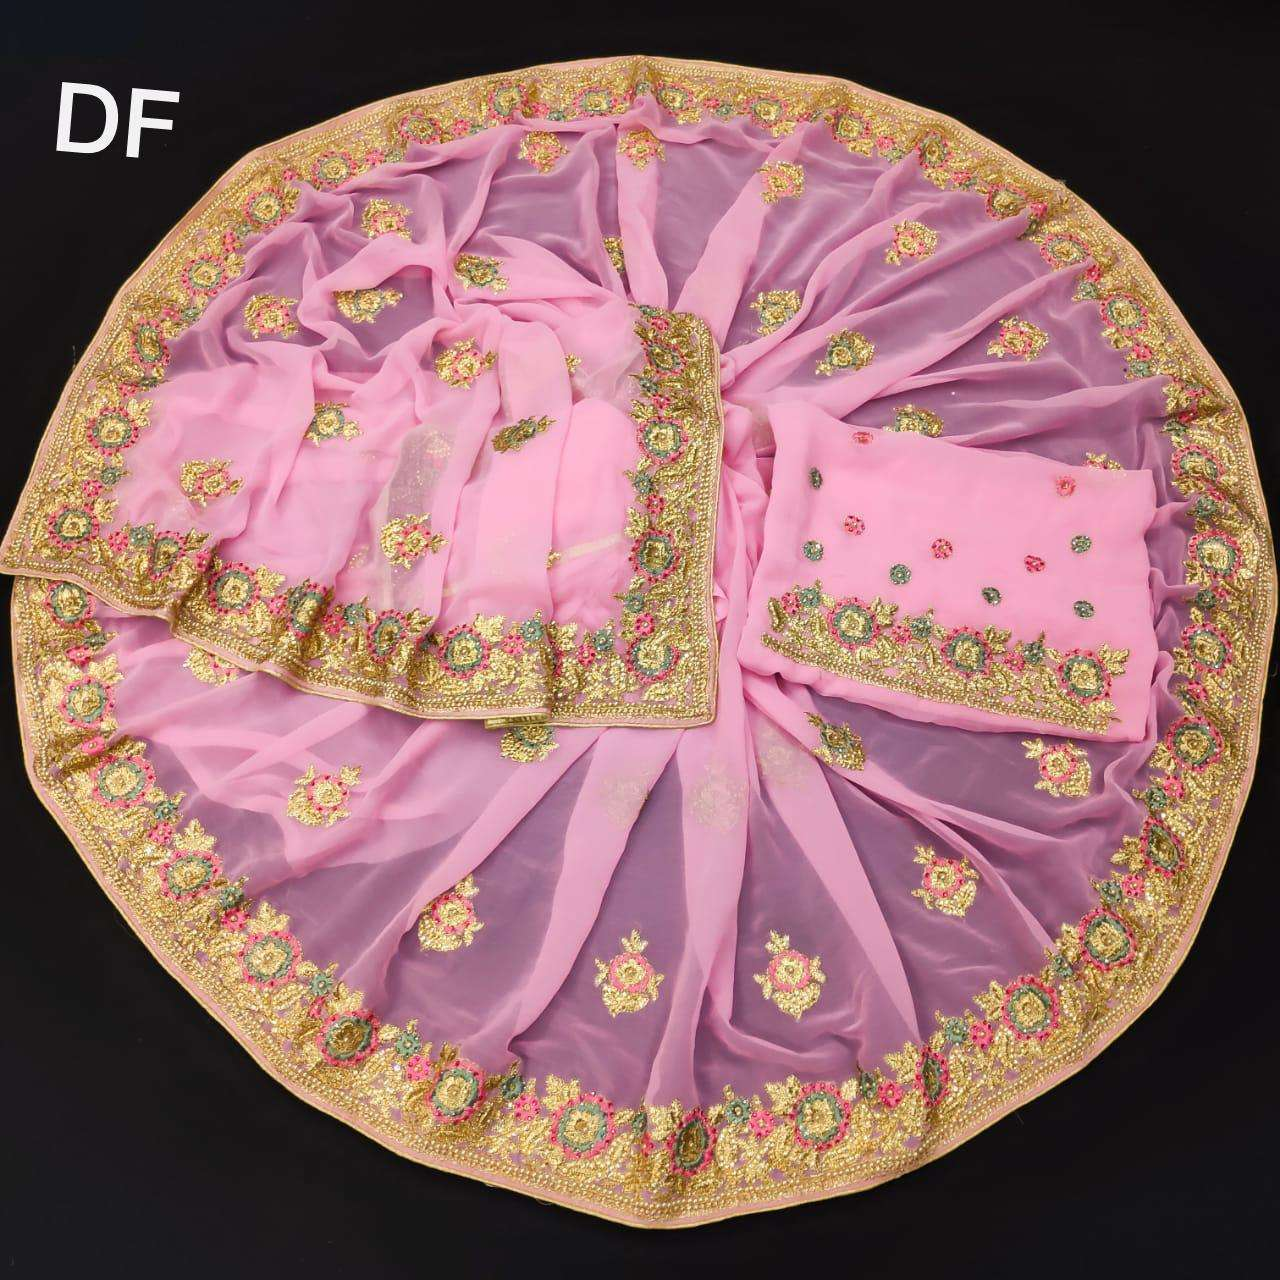 Df 4024 Vichitra Silk Georgette With Multi Embroidery Zari Work Sarees Collection  04